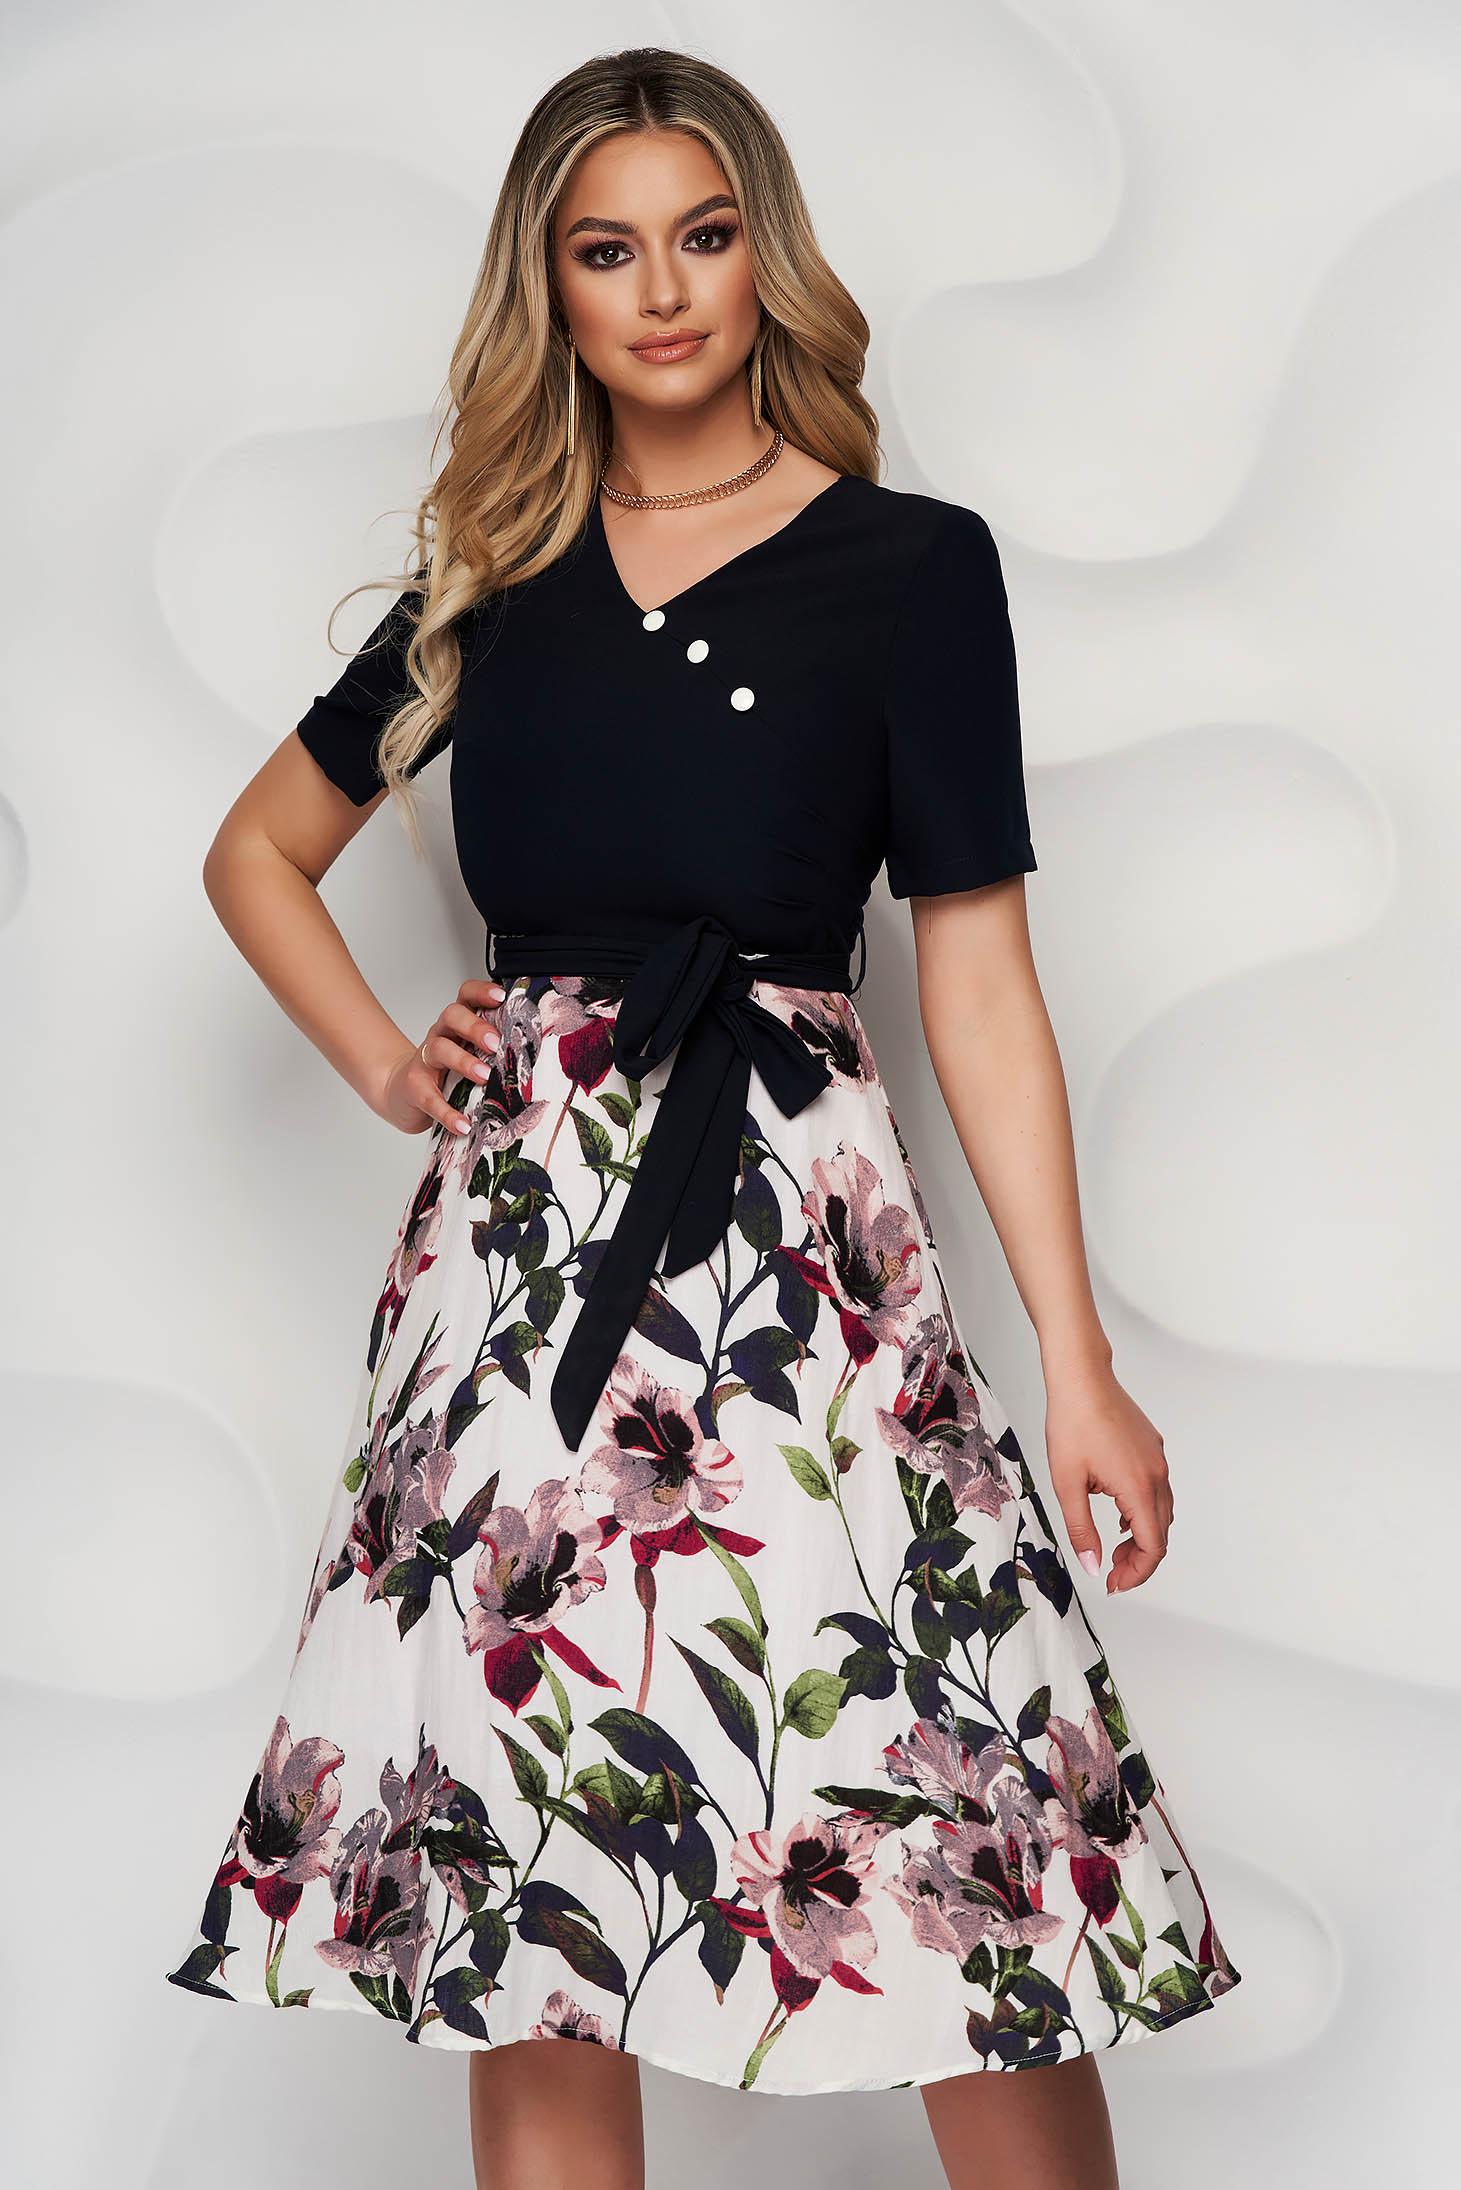 Dress cloche midi cotton with floral print